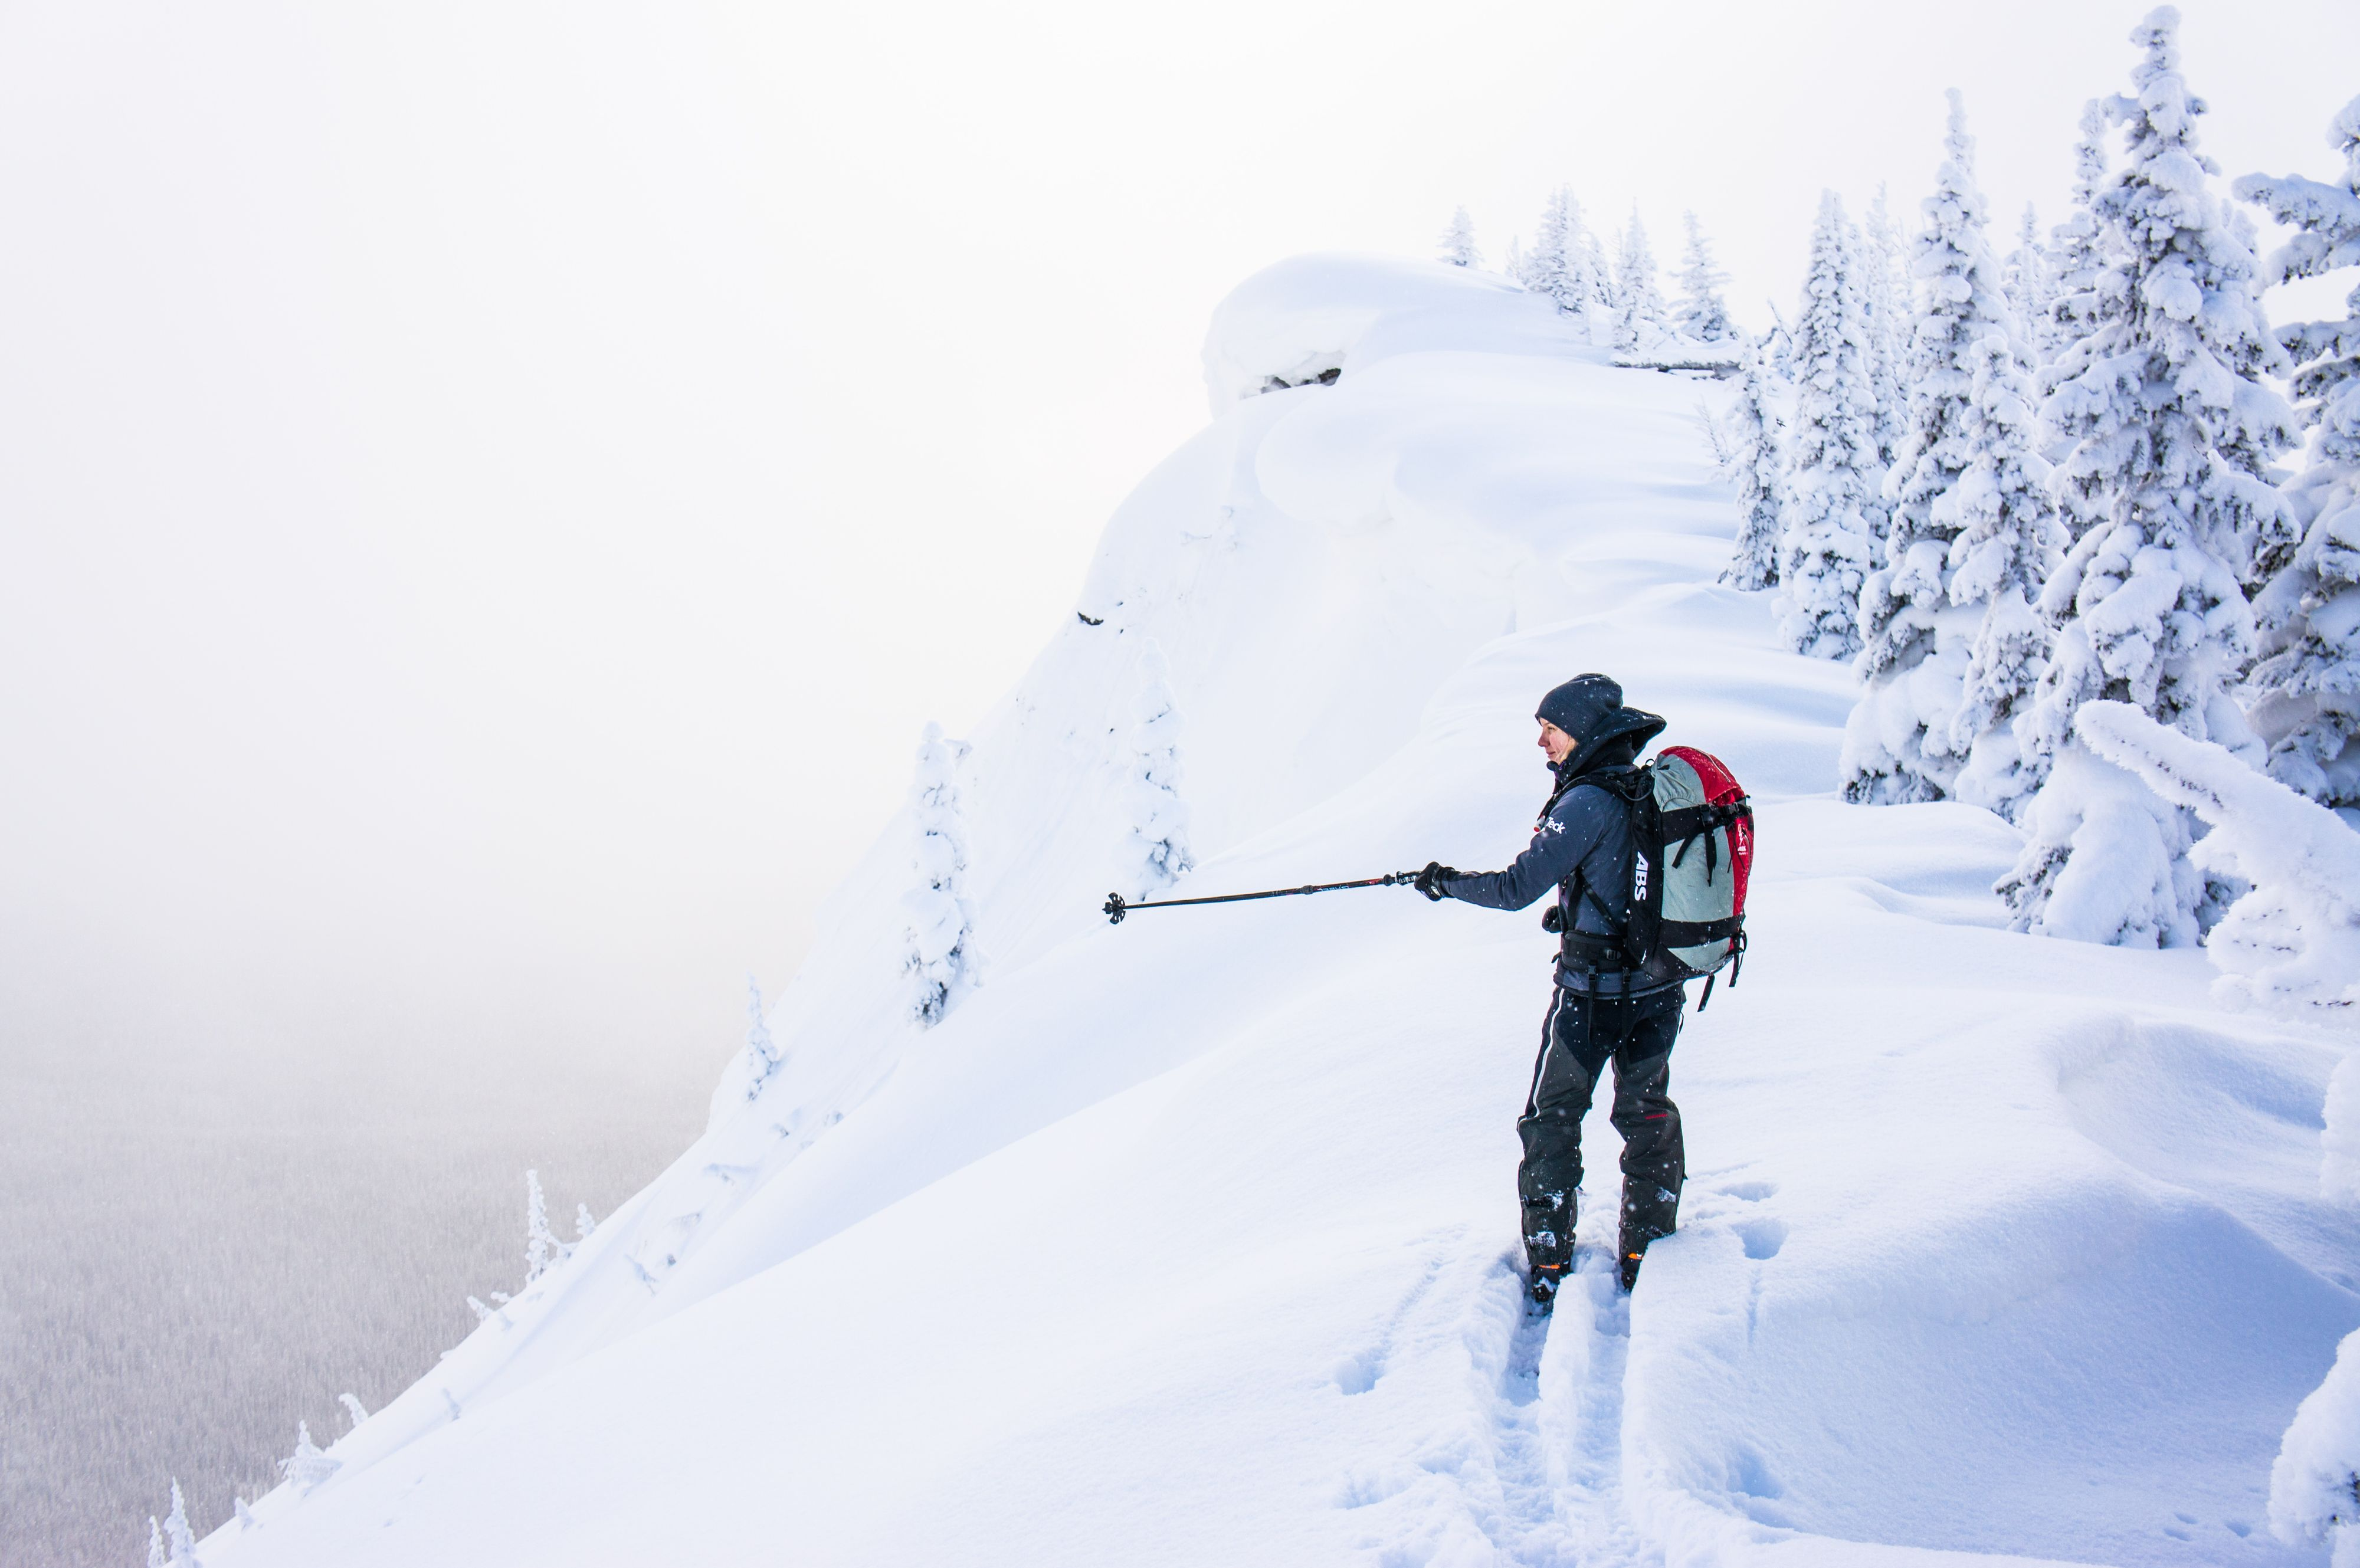 Skier standing on ridge